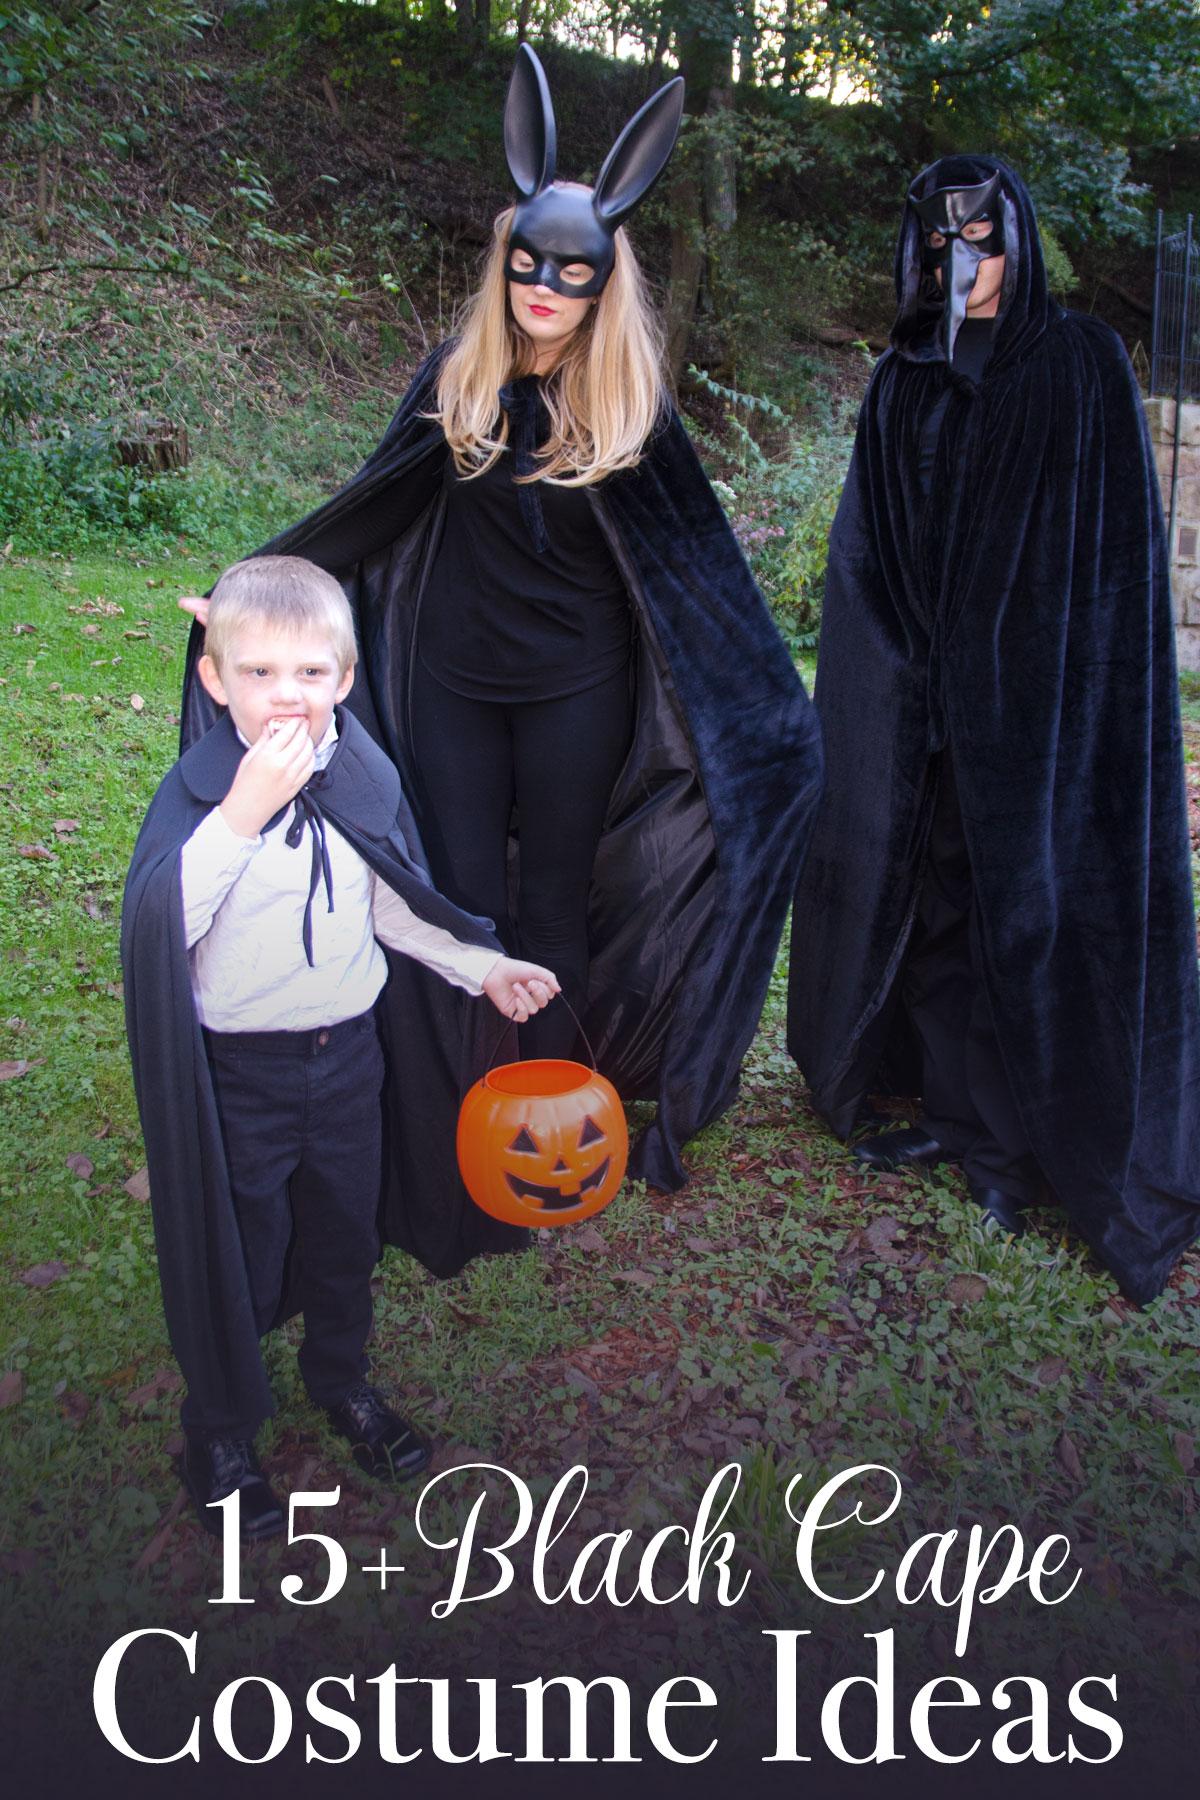 27 Black Cape Costume Ideas for the Whole Family - Bit & Bauble